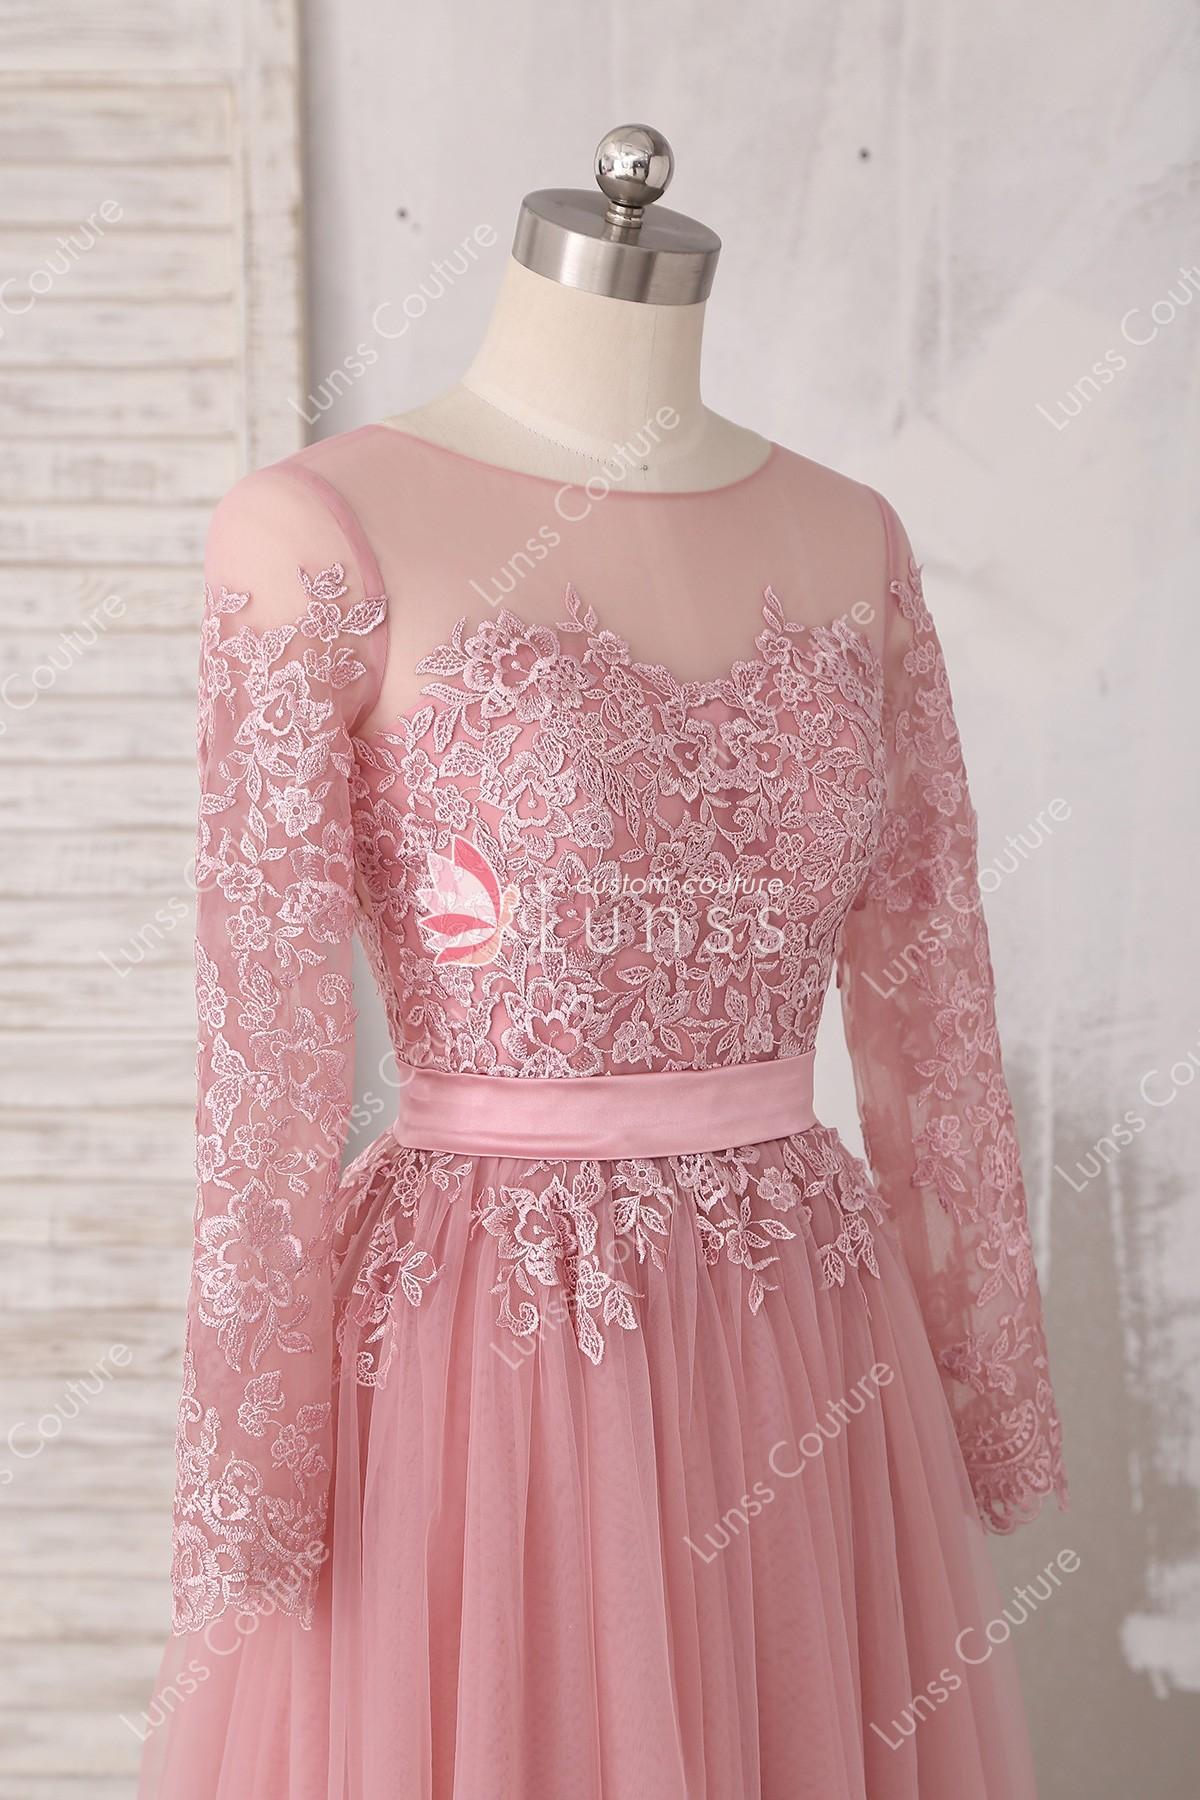 wholesale elegant dresses photo - 1